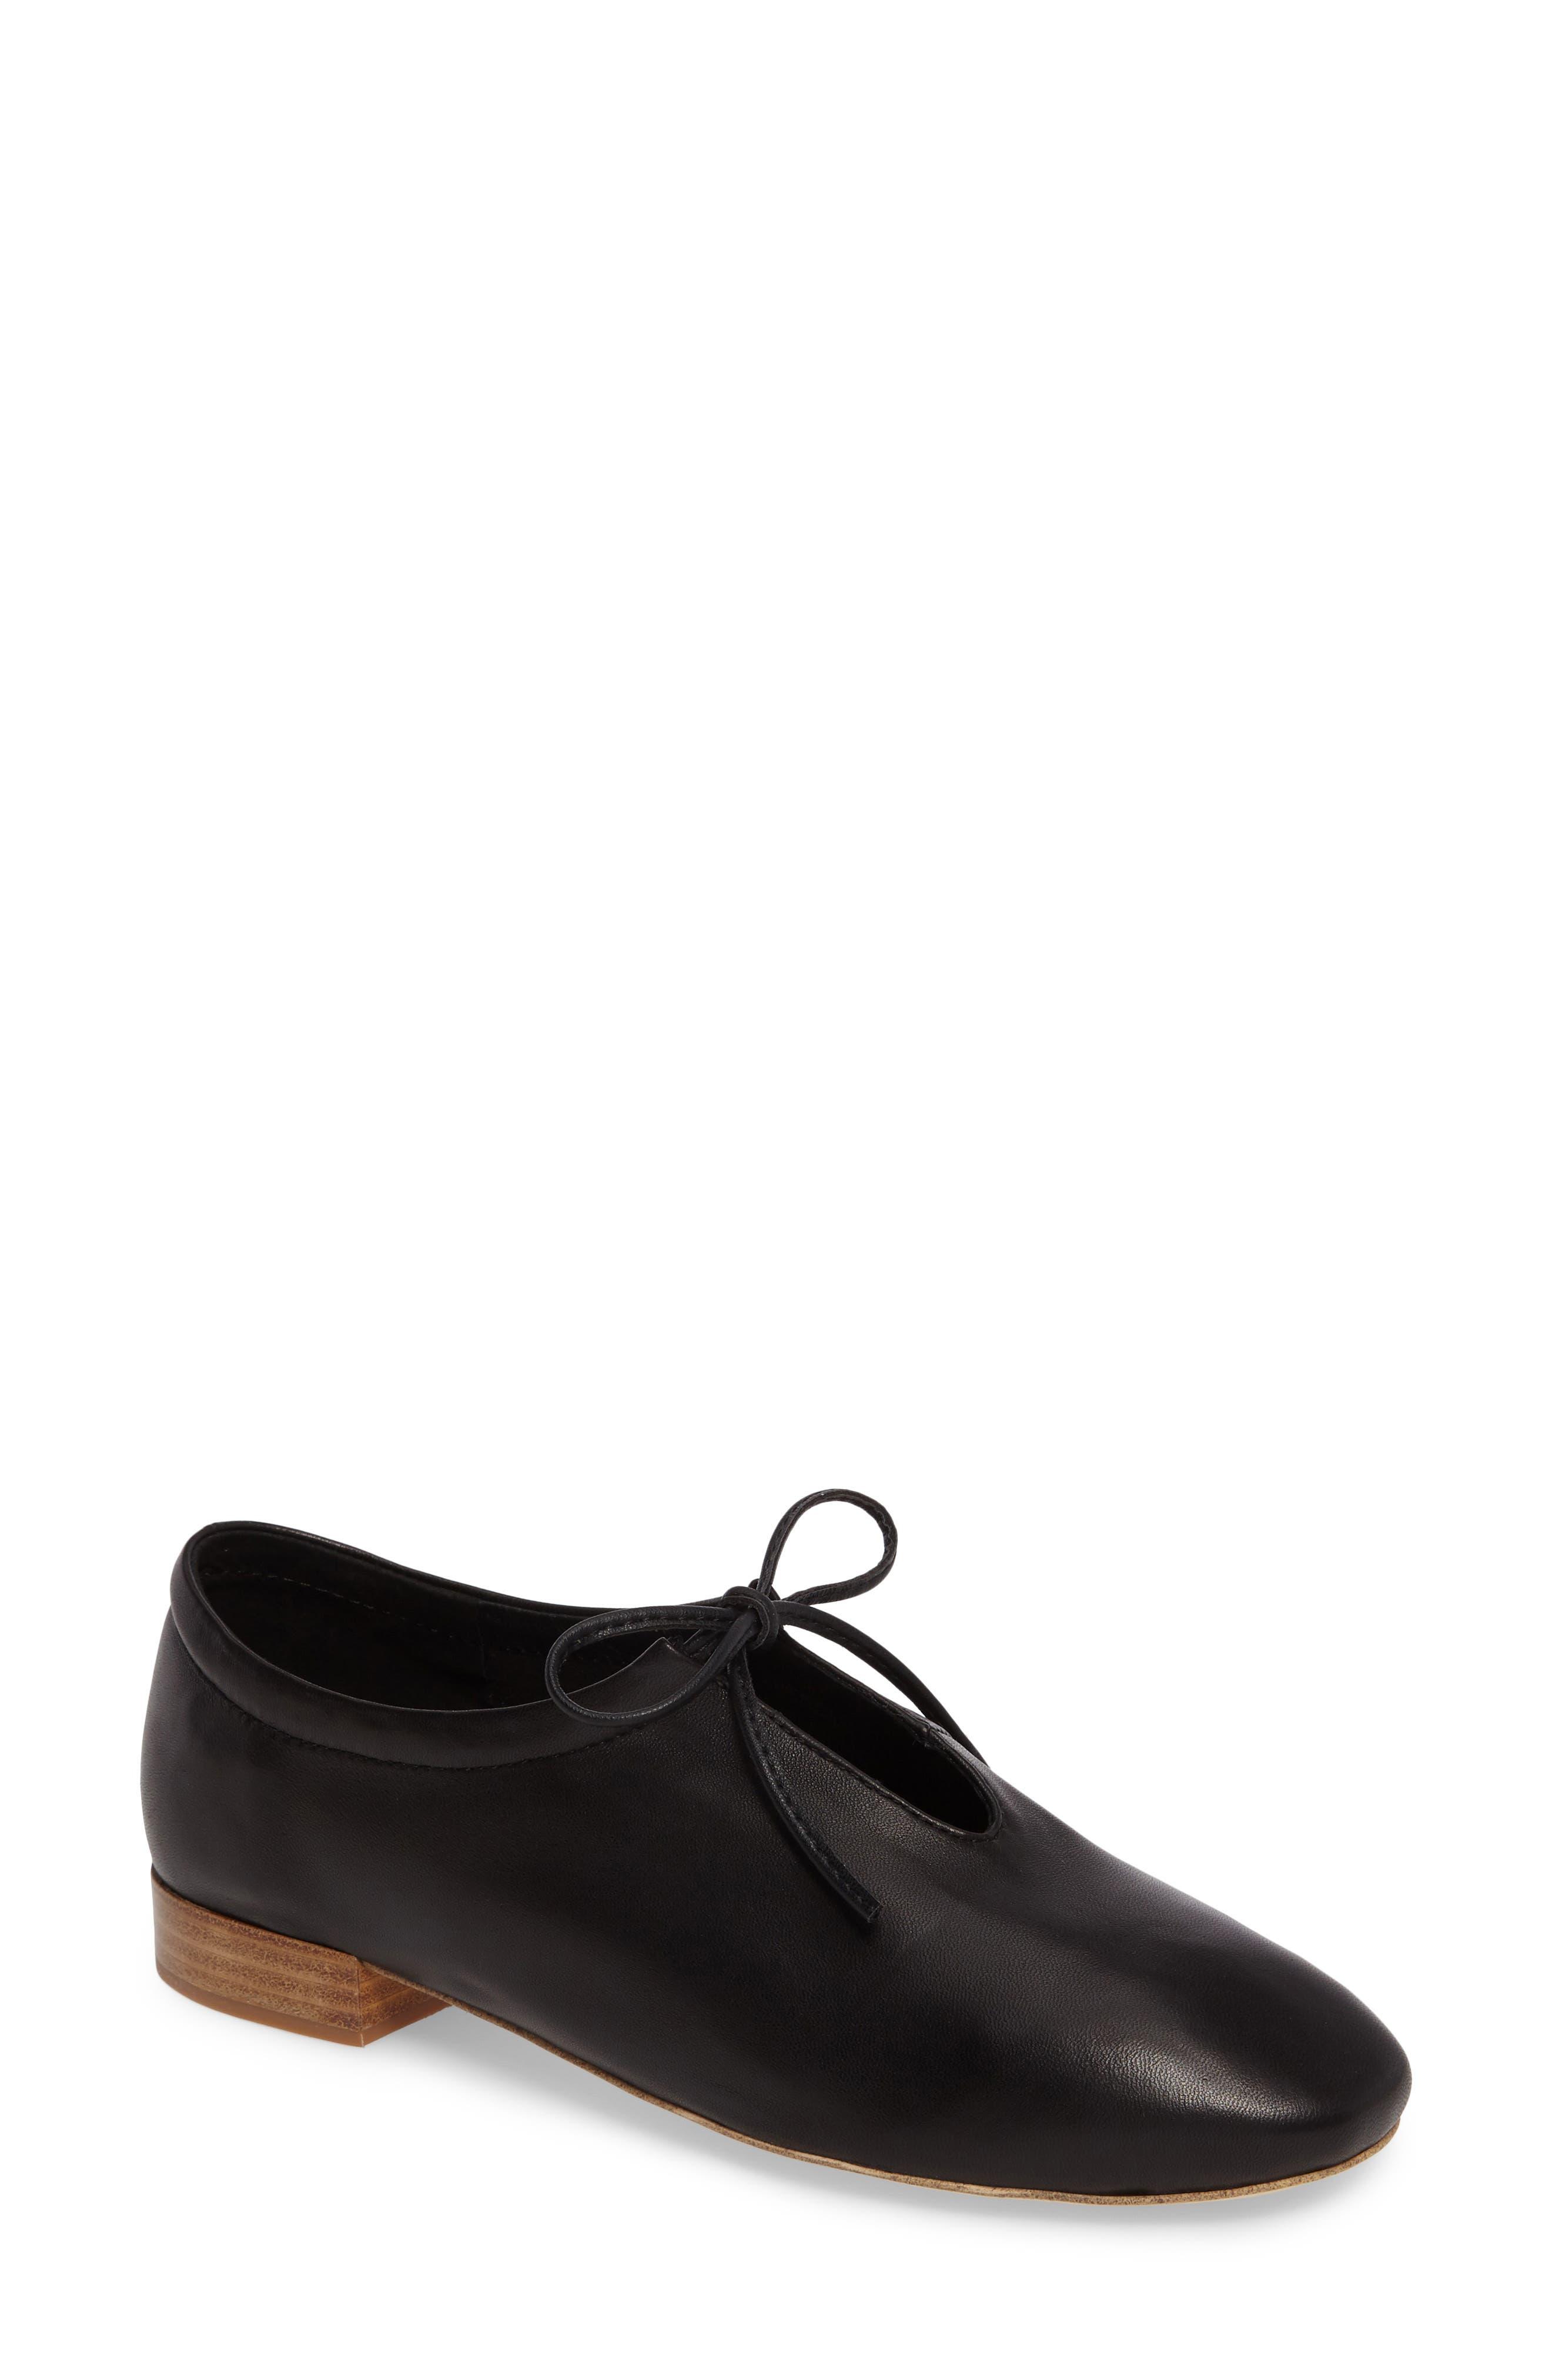 Prieto V-Cut Flat,                         Main,                         color, Black Leather